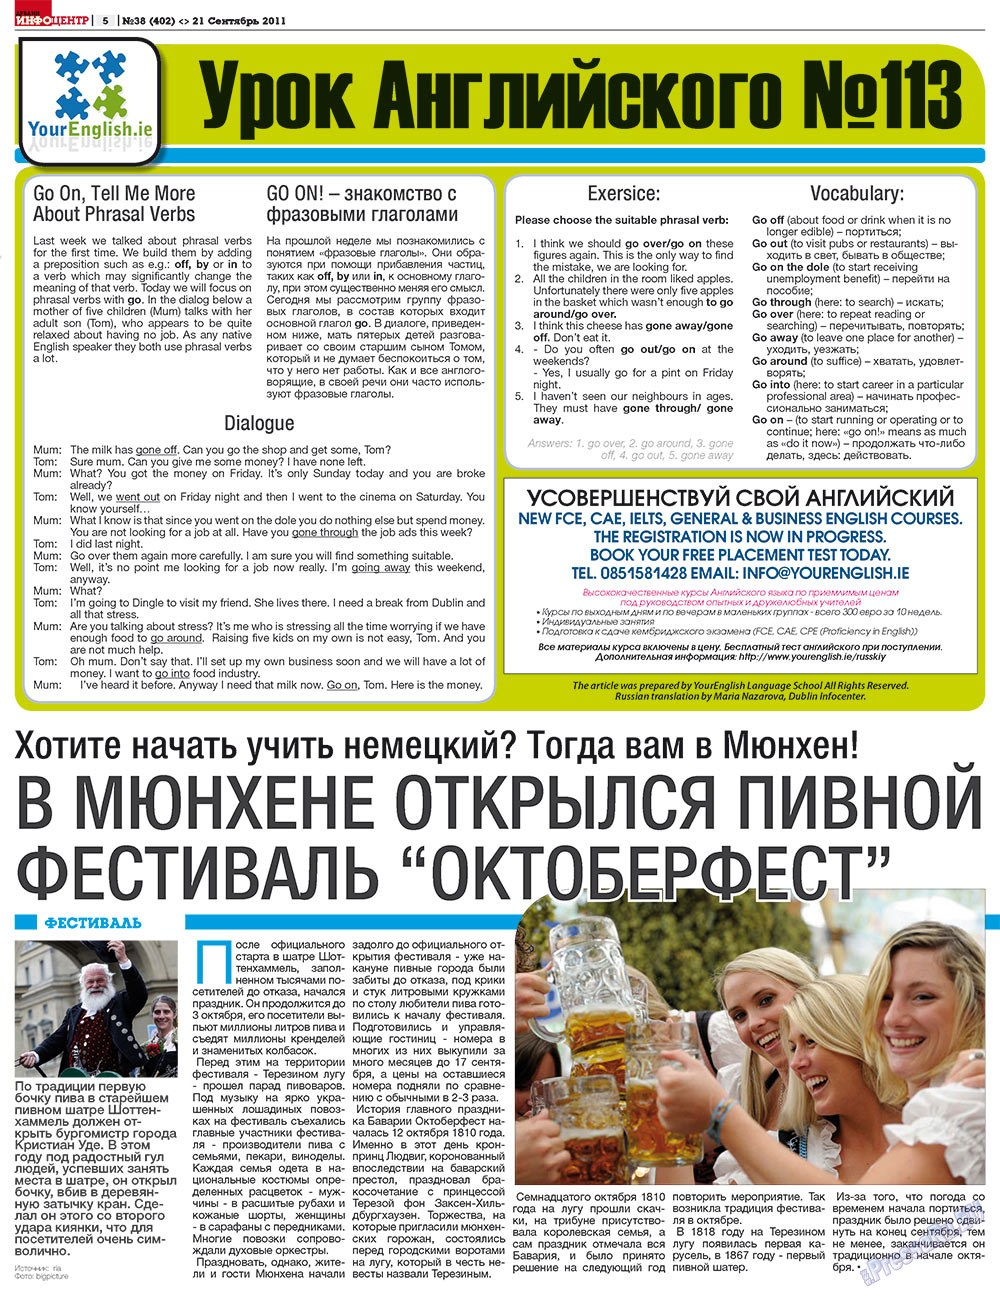 Дублин инфоцентр (газета). 2011 год, номер 38, стр. 5